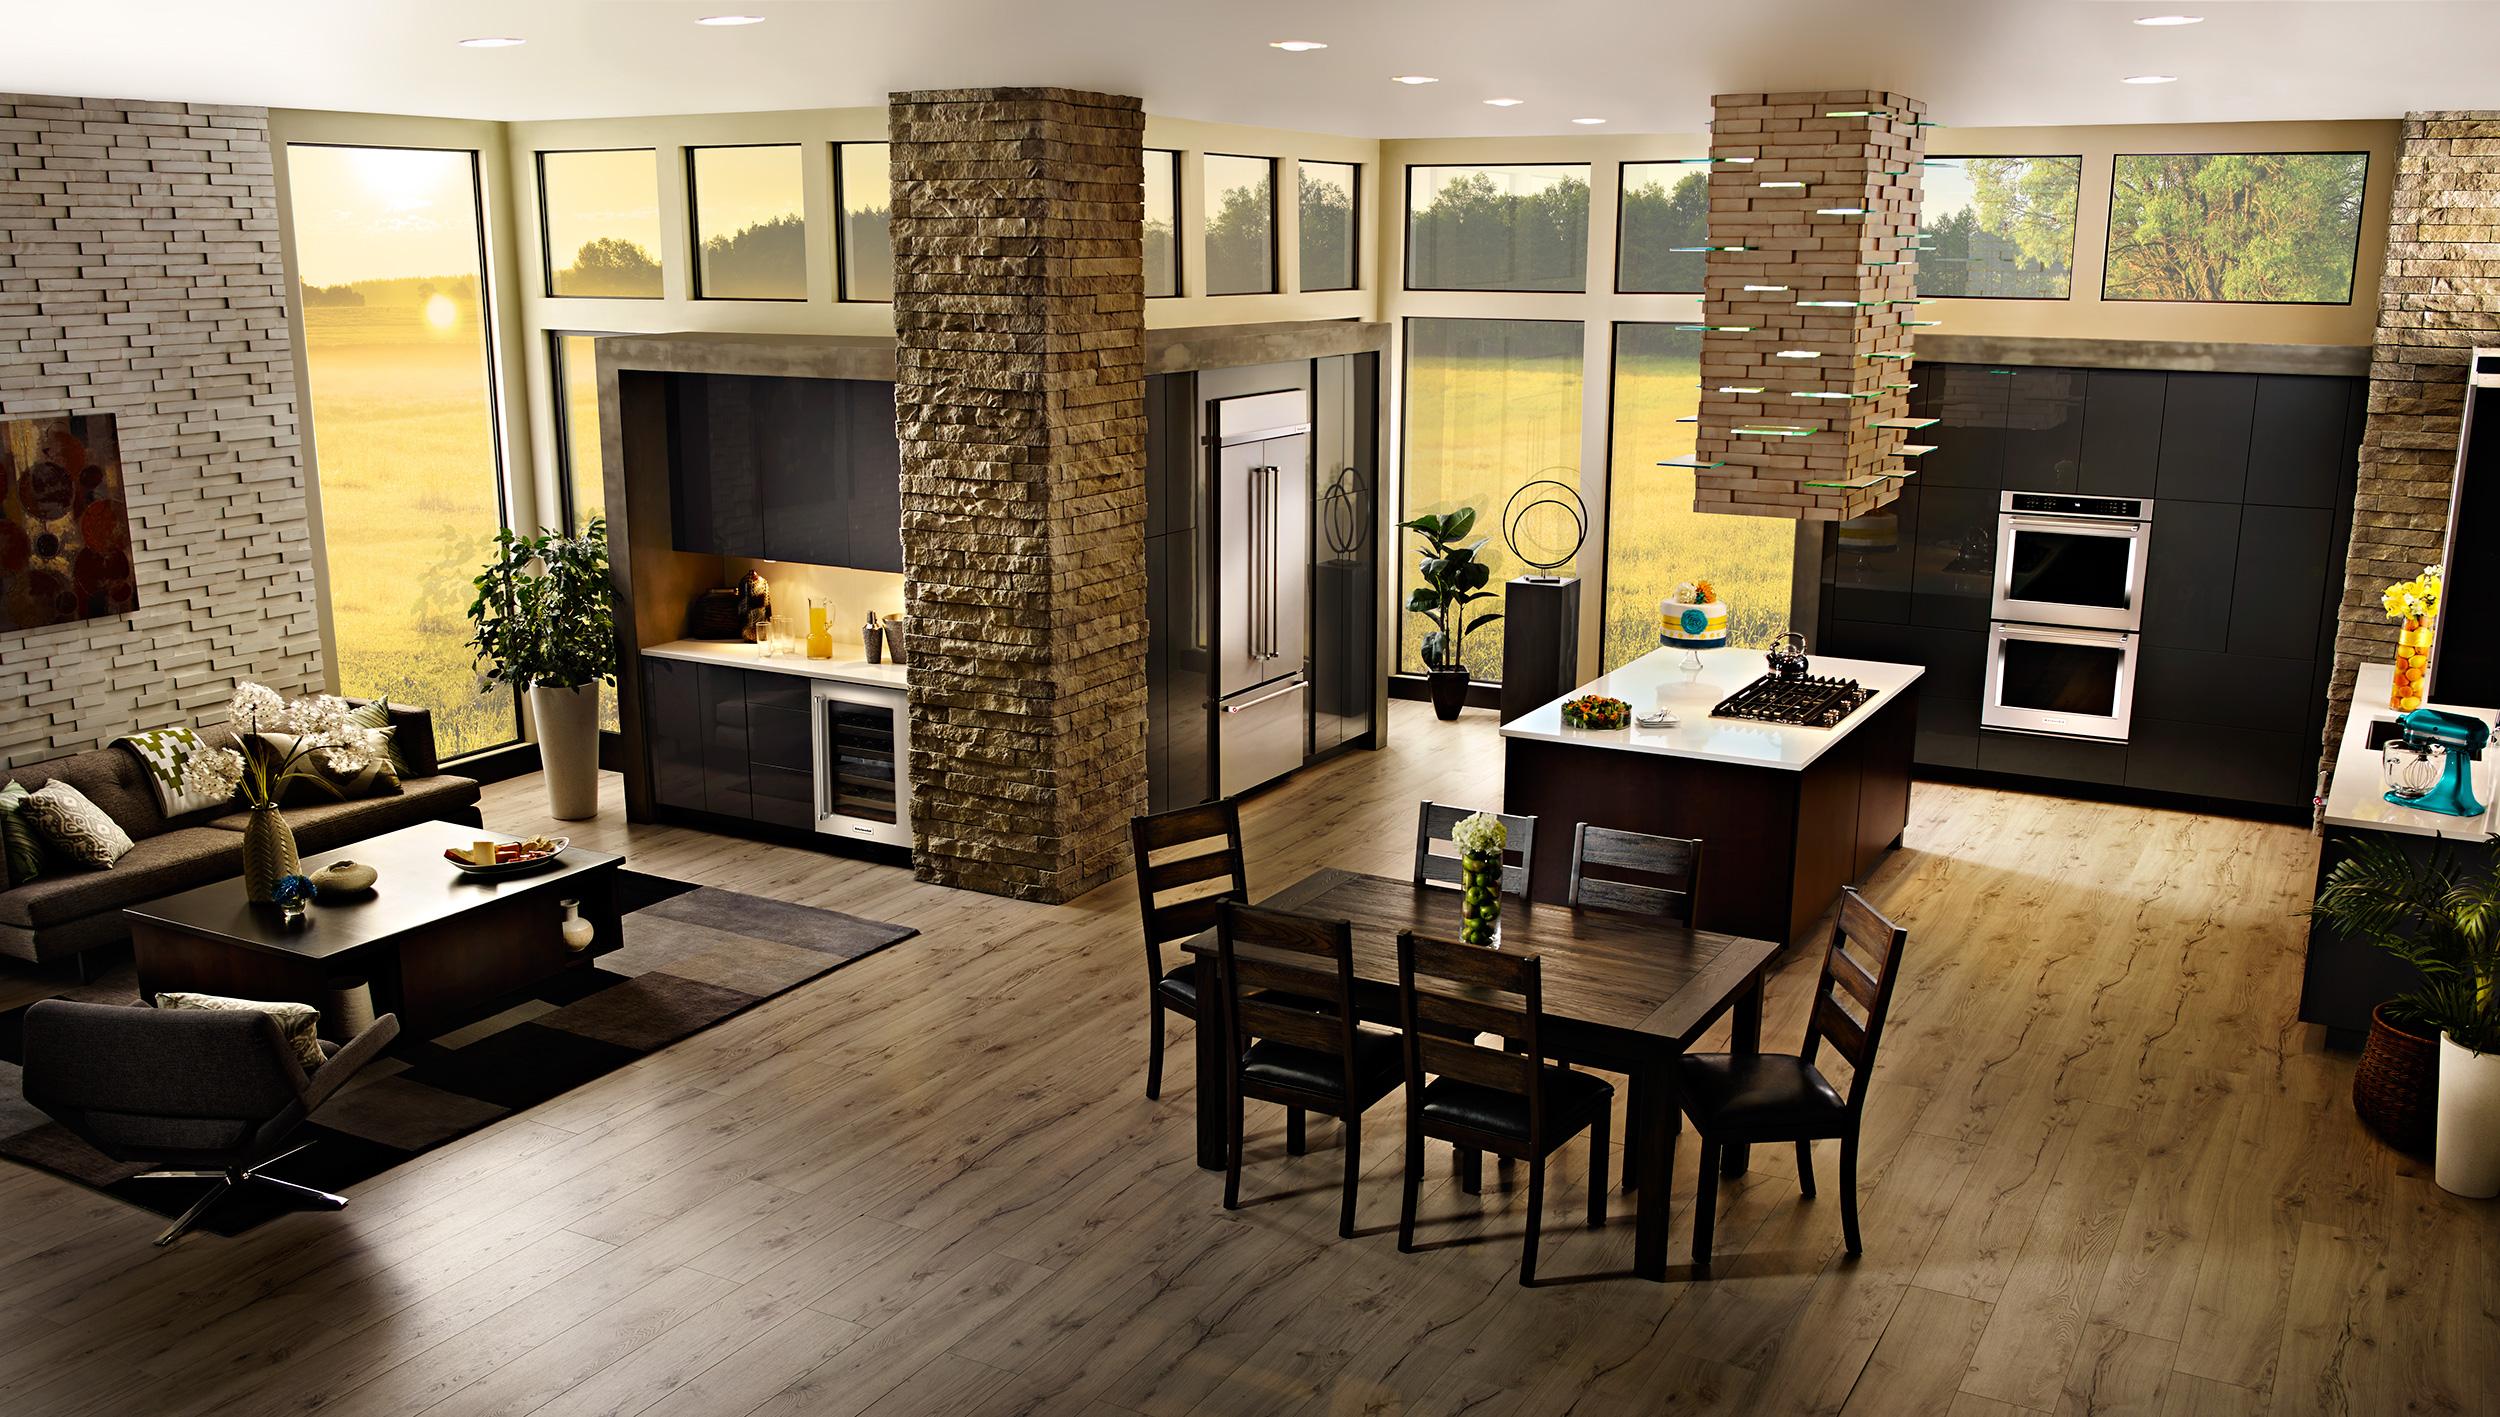 Luxurious KitchenAid Kitchens